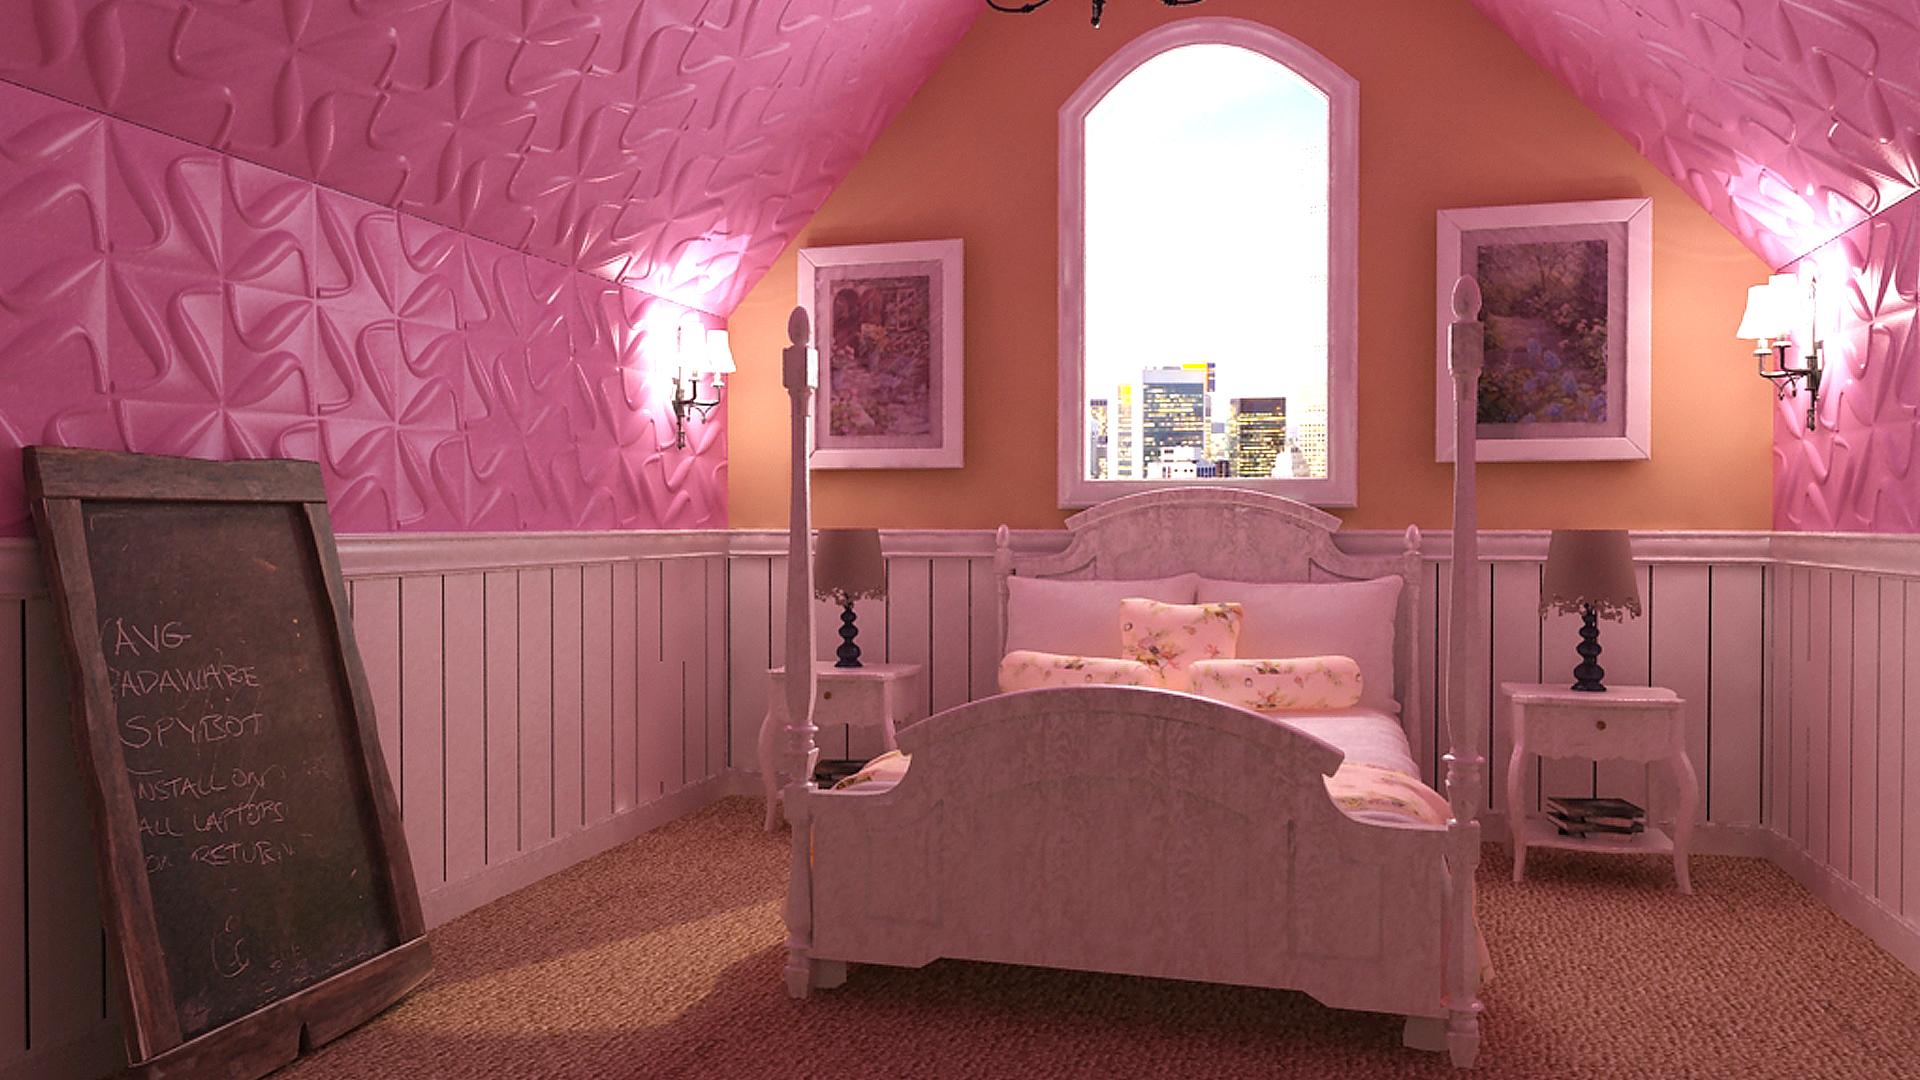 kinderzimmer 3d wandpaneele deckenpaneele wandverkleidung aus bambus. Black Bedroom Furniture Sets. Home Design Ideas